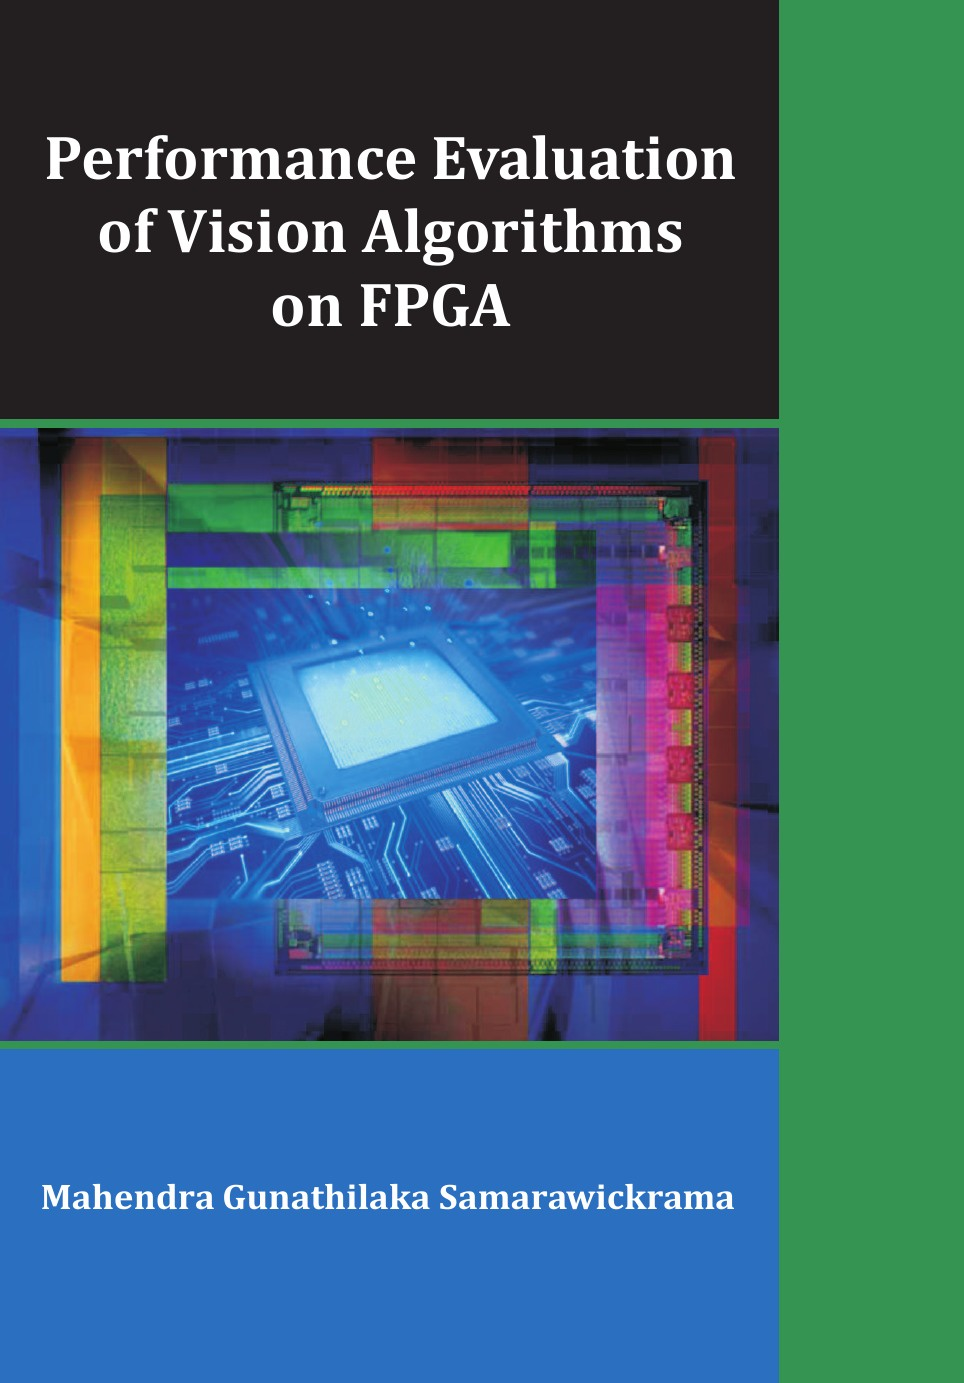 Mahendra Gunathilaka Samarawickrama Performance Evaluation of Vision Algorithms on FPGA